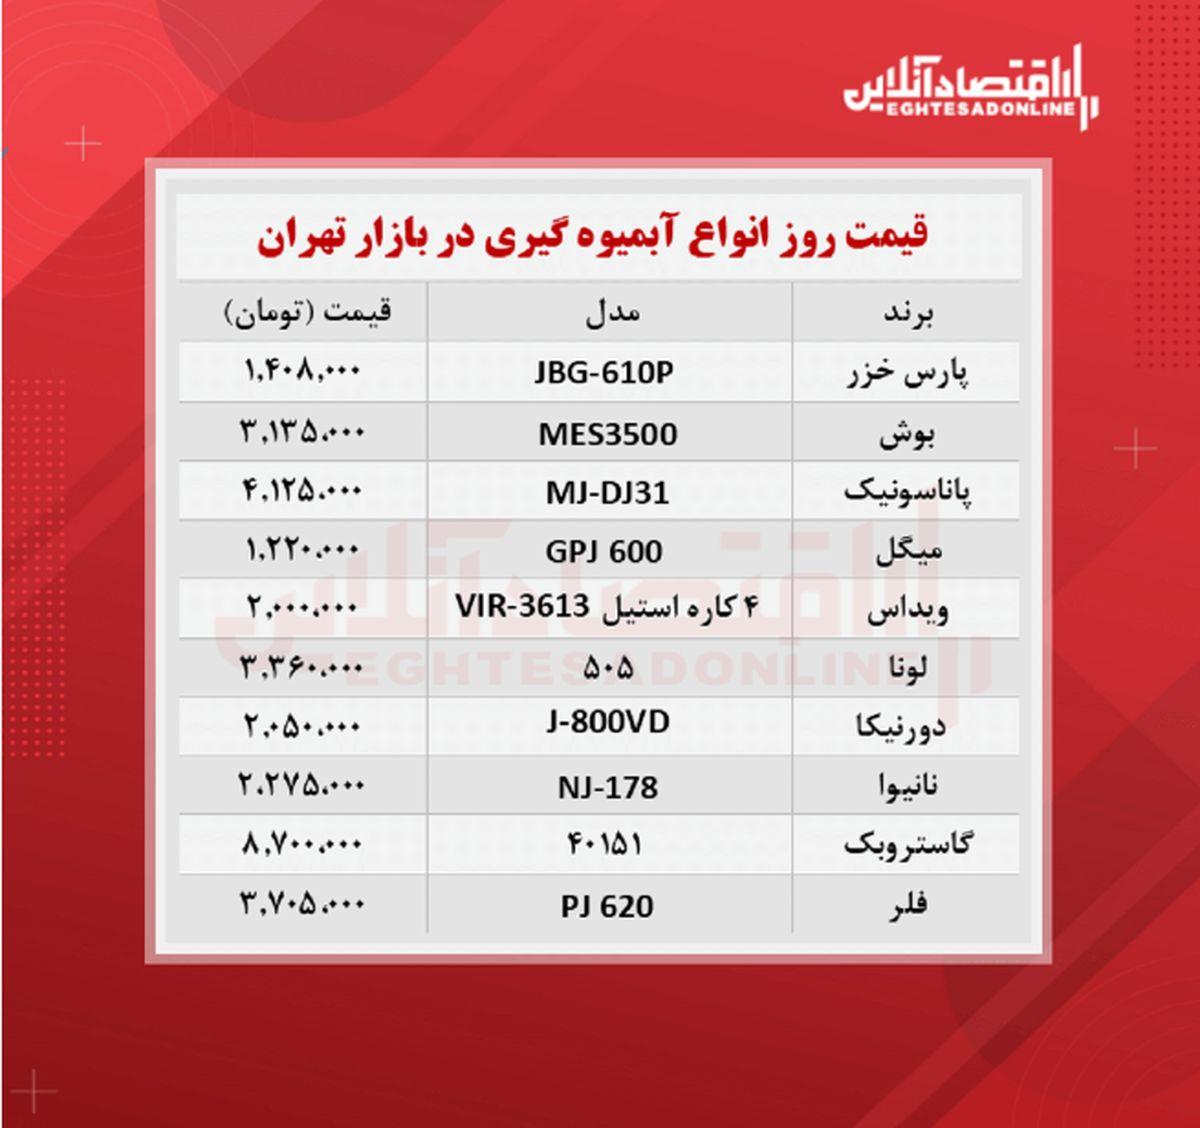 قیمت جدید آبمیوه گیری (شهریور ۱۴۰۰)